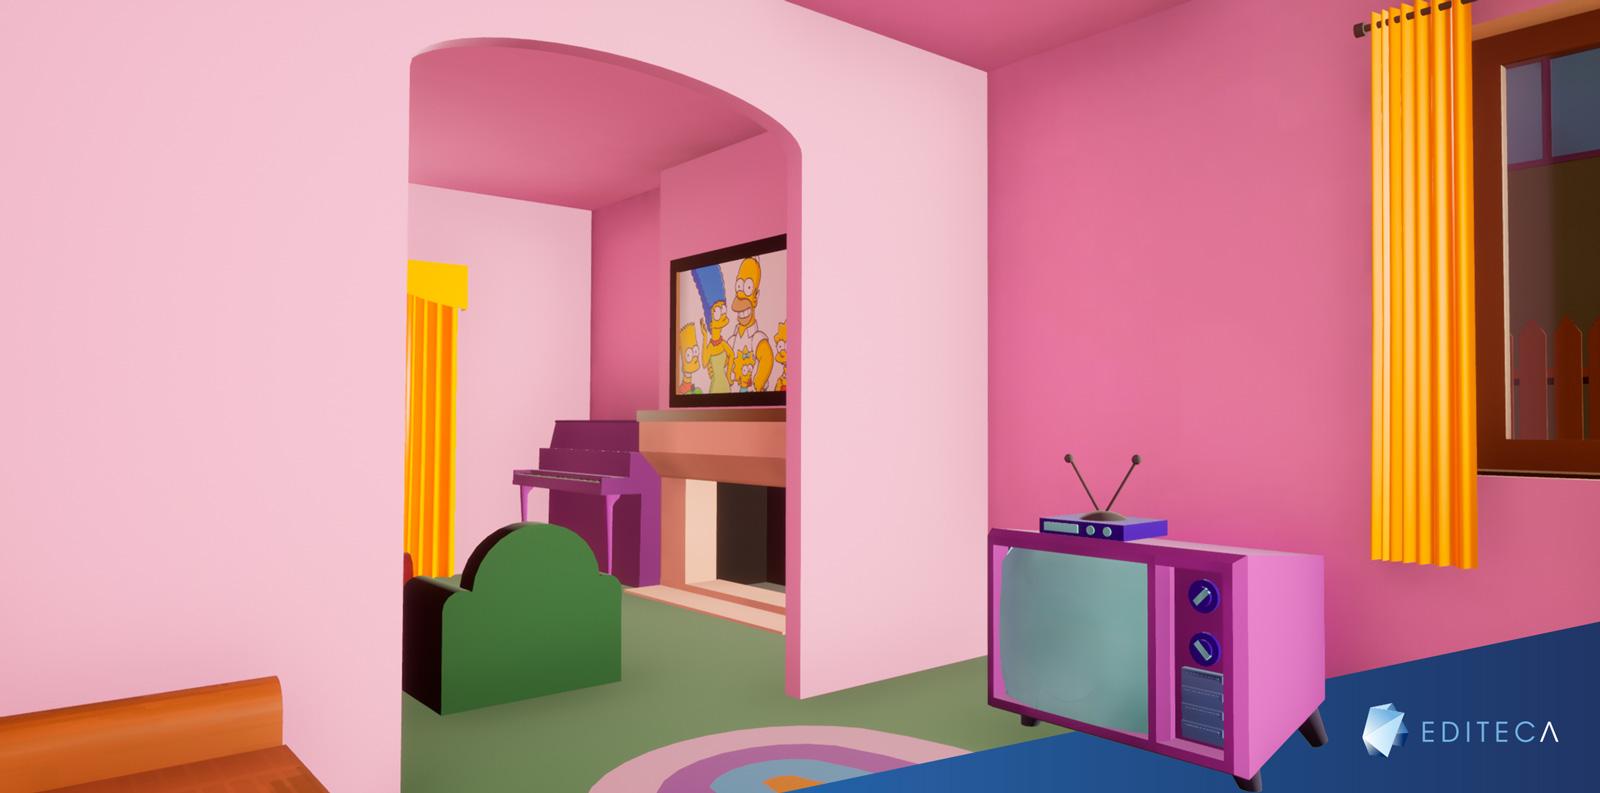 proyecto-VR-Unreal-engine-Simpsons-Editeca-3